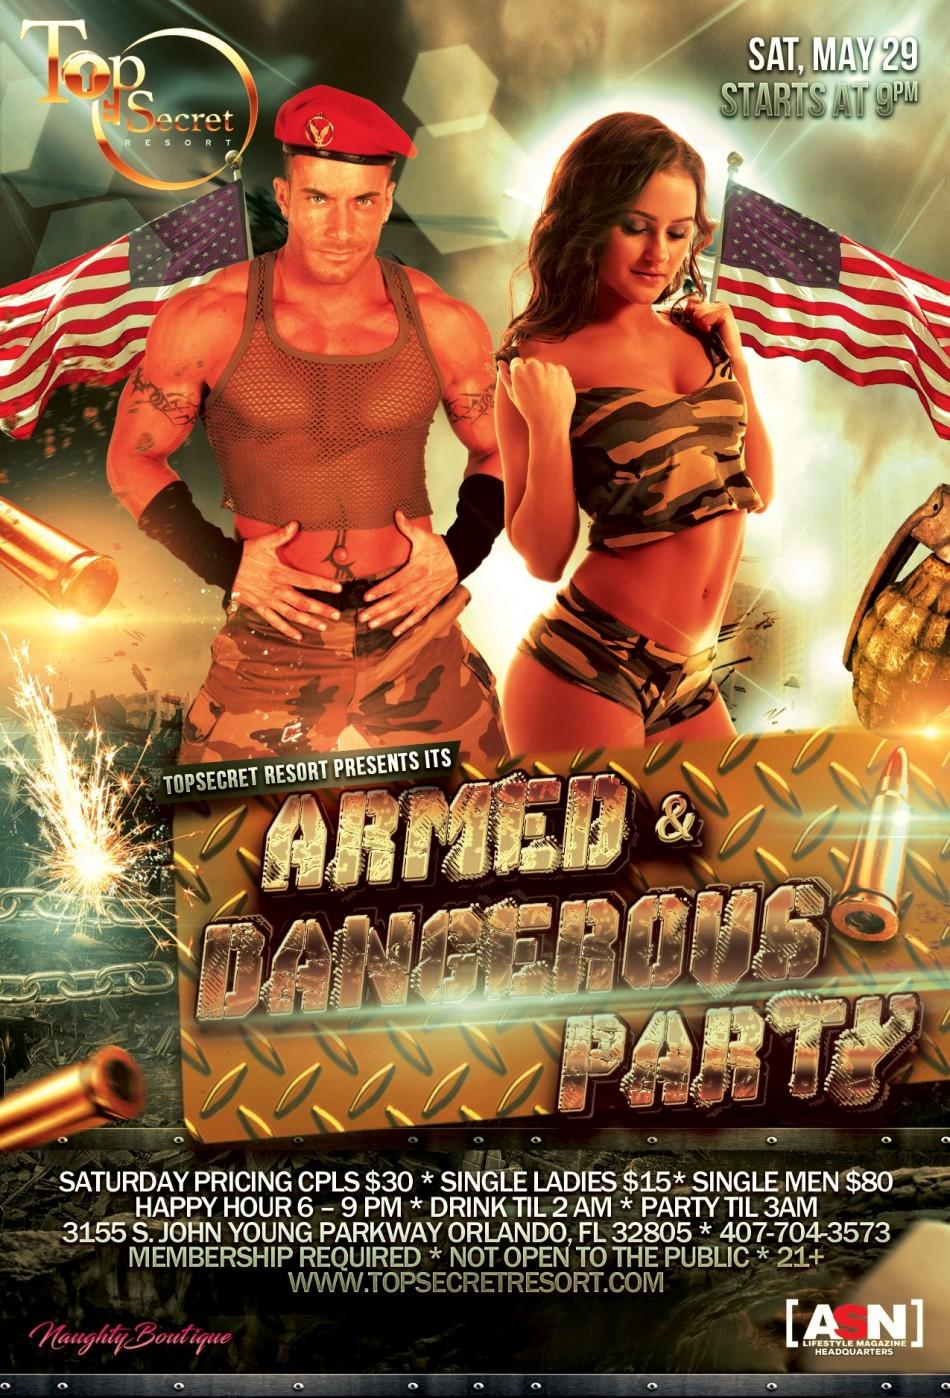 SIN-Dependence Weekend - Armed and Dangerous @ TopSecret Resort